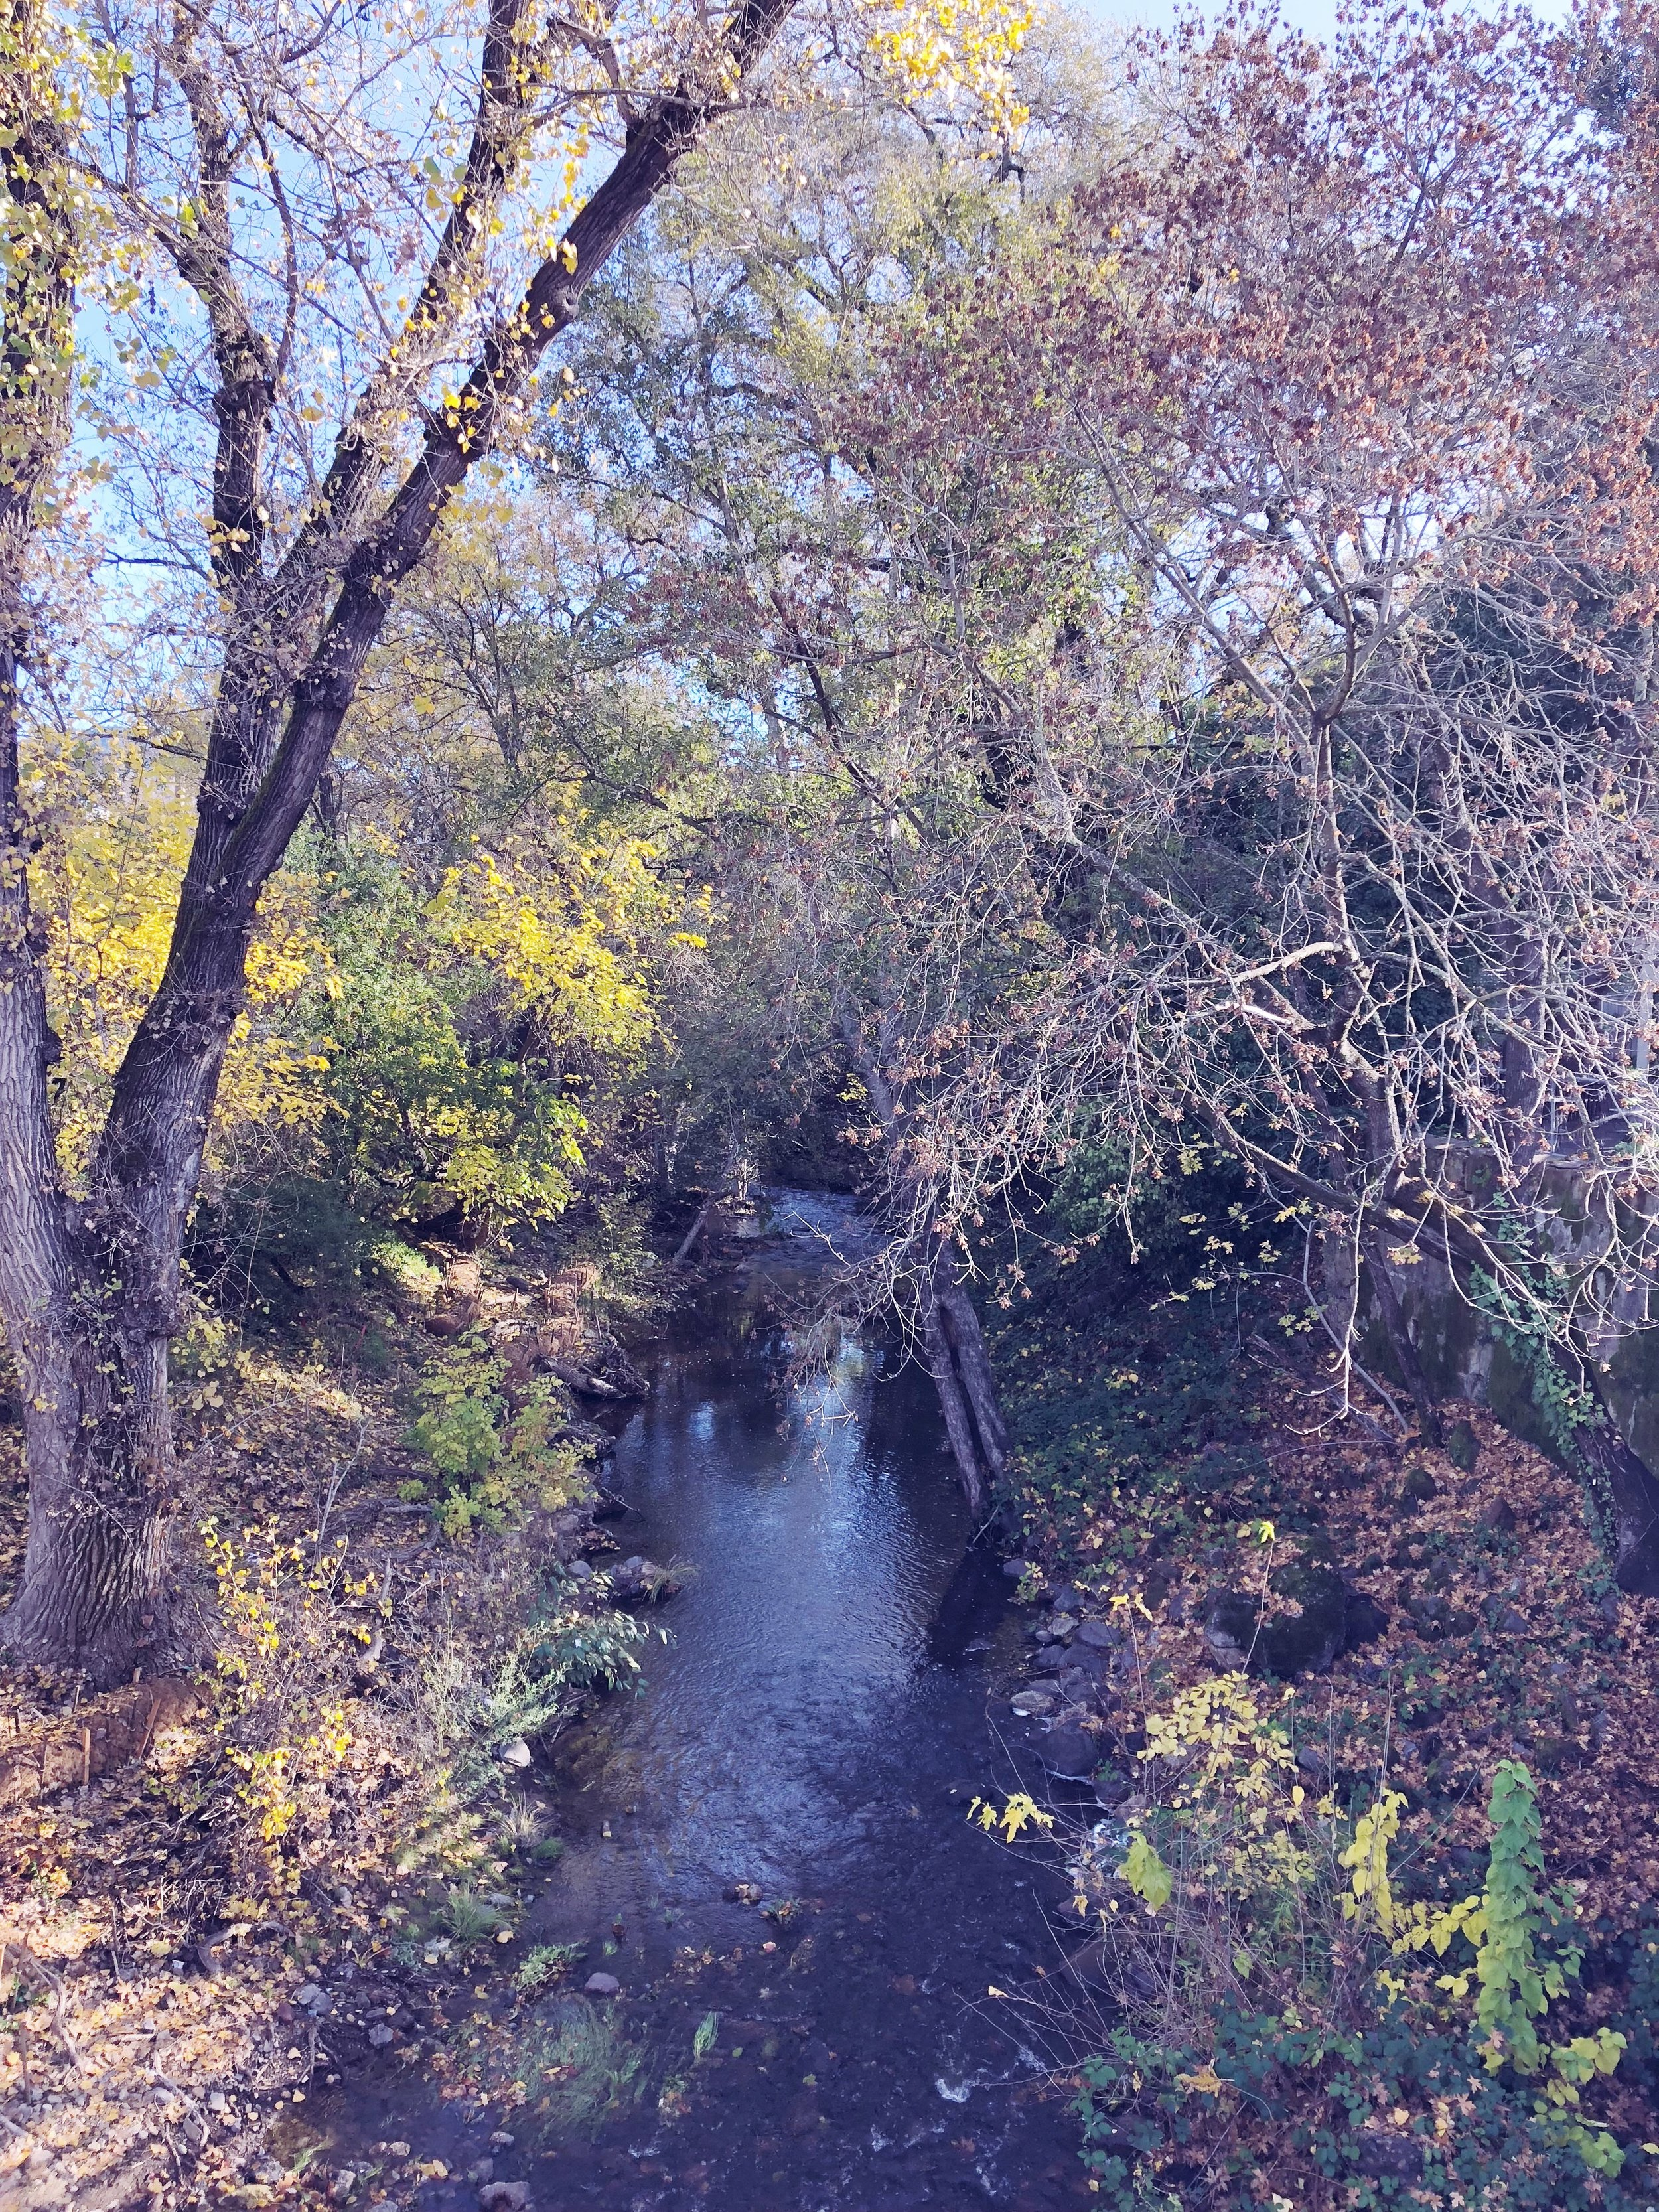 The Napa River flows through downtown Calistoga